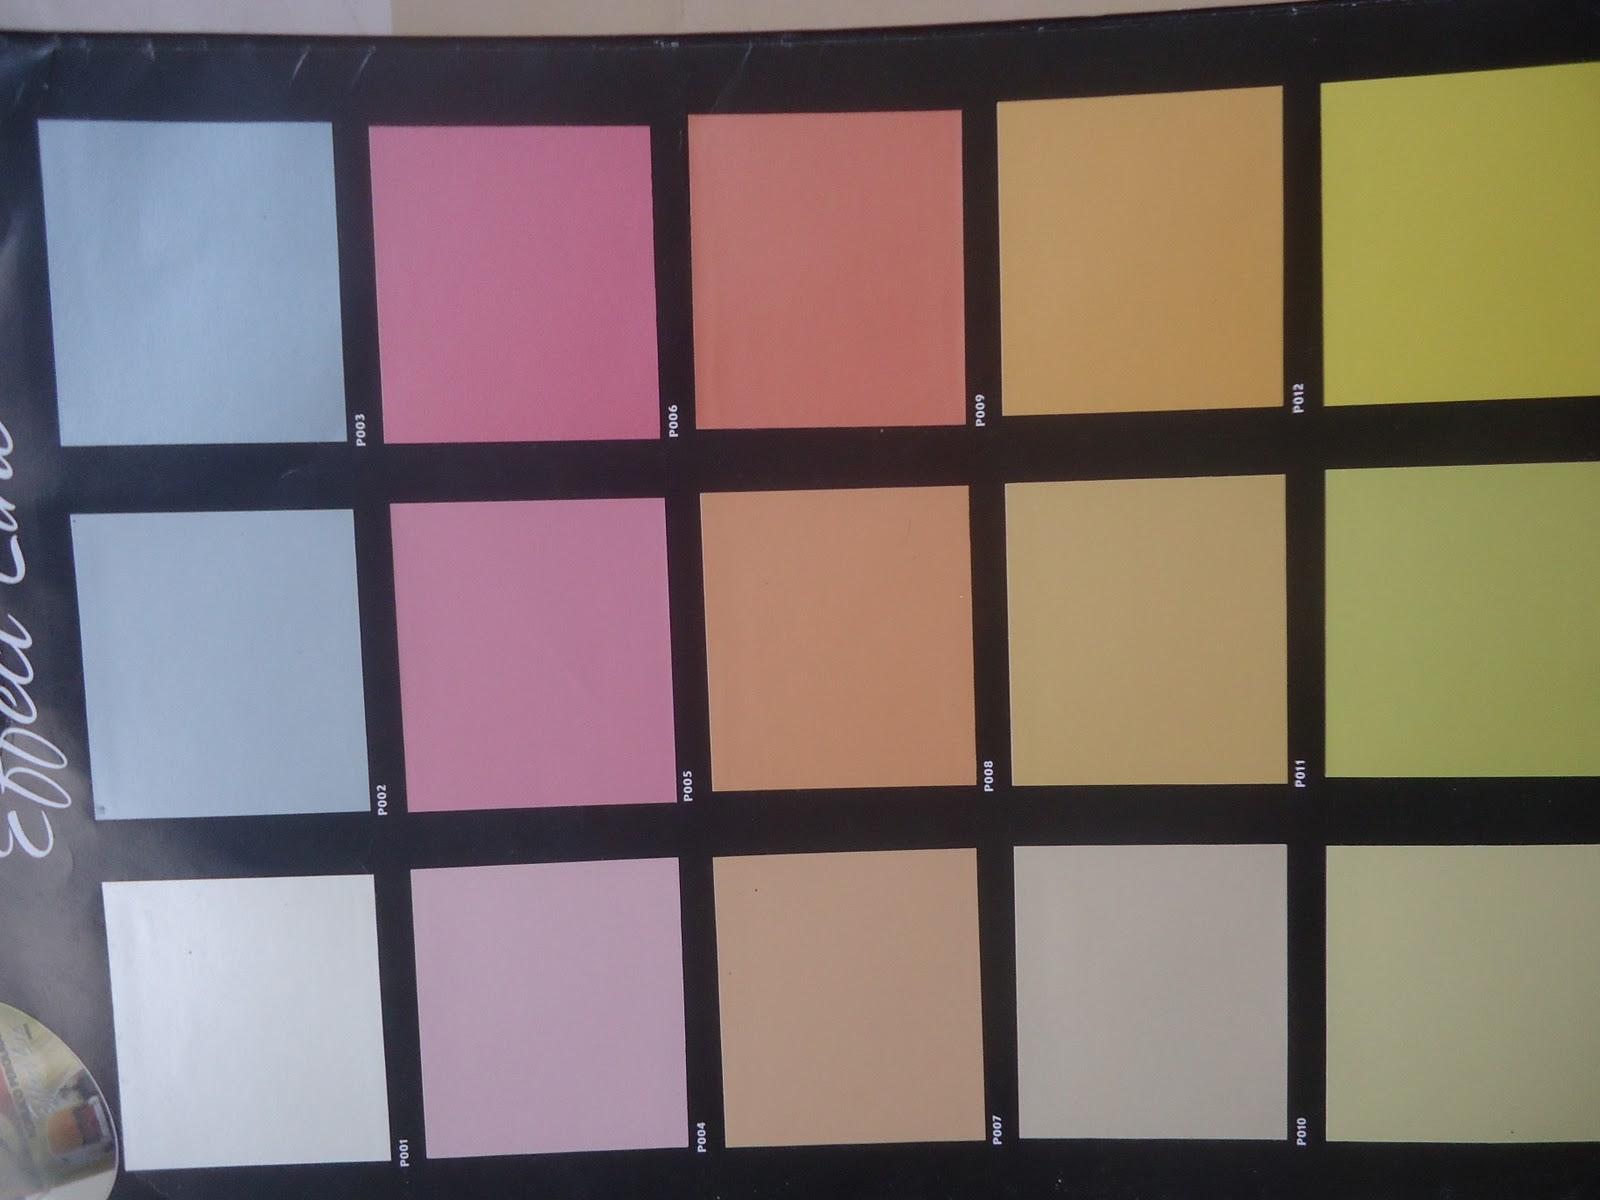 Cores De Tinta Para Area Externa Cinza E Branco Grafiatos De Cores  -> Fotos De Paredes Com Grafiato